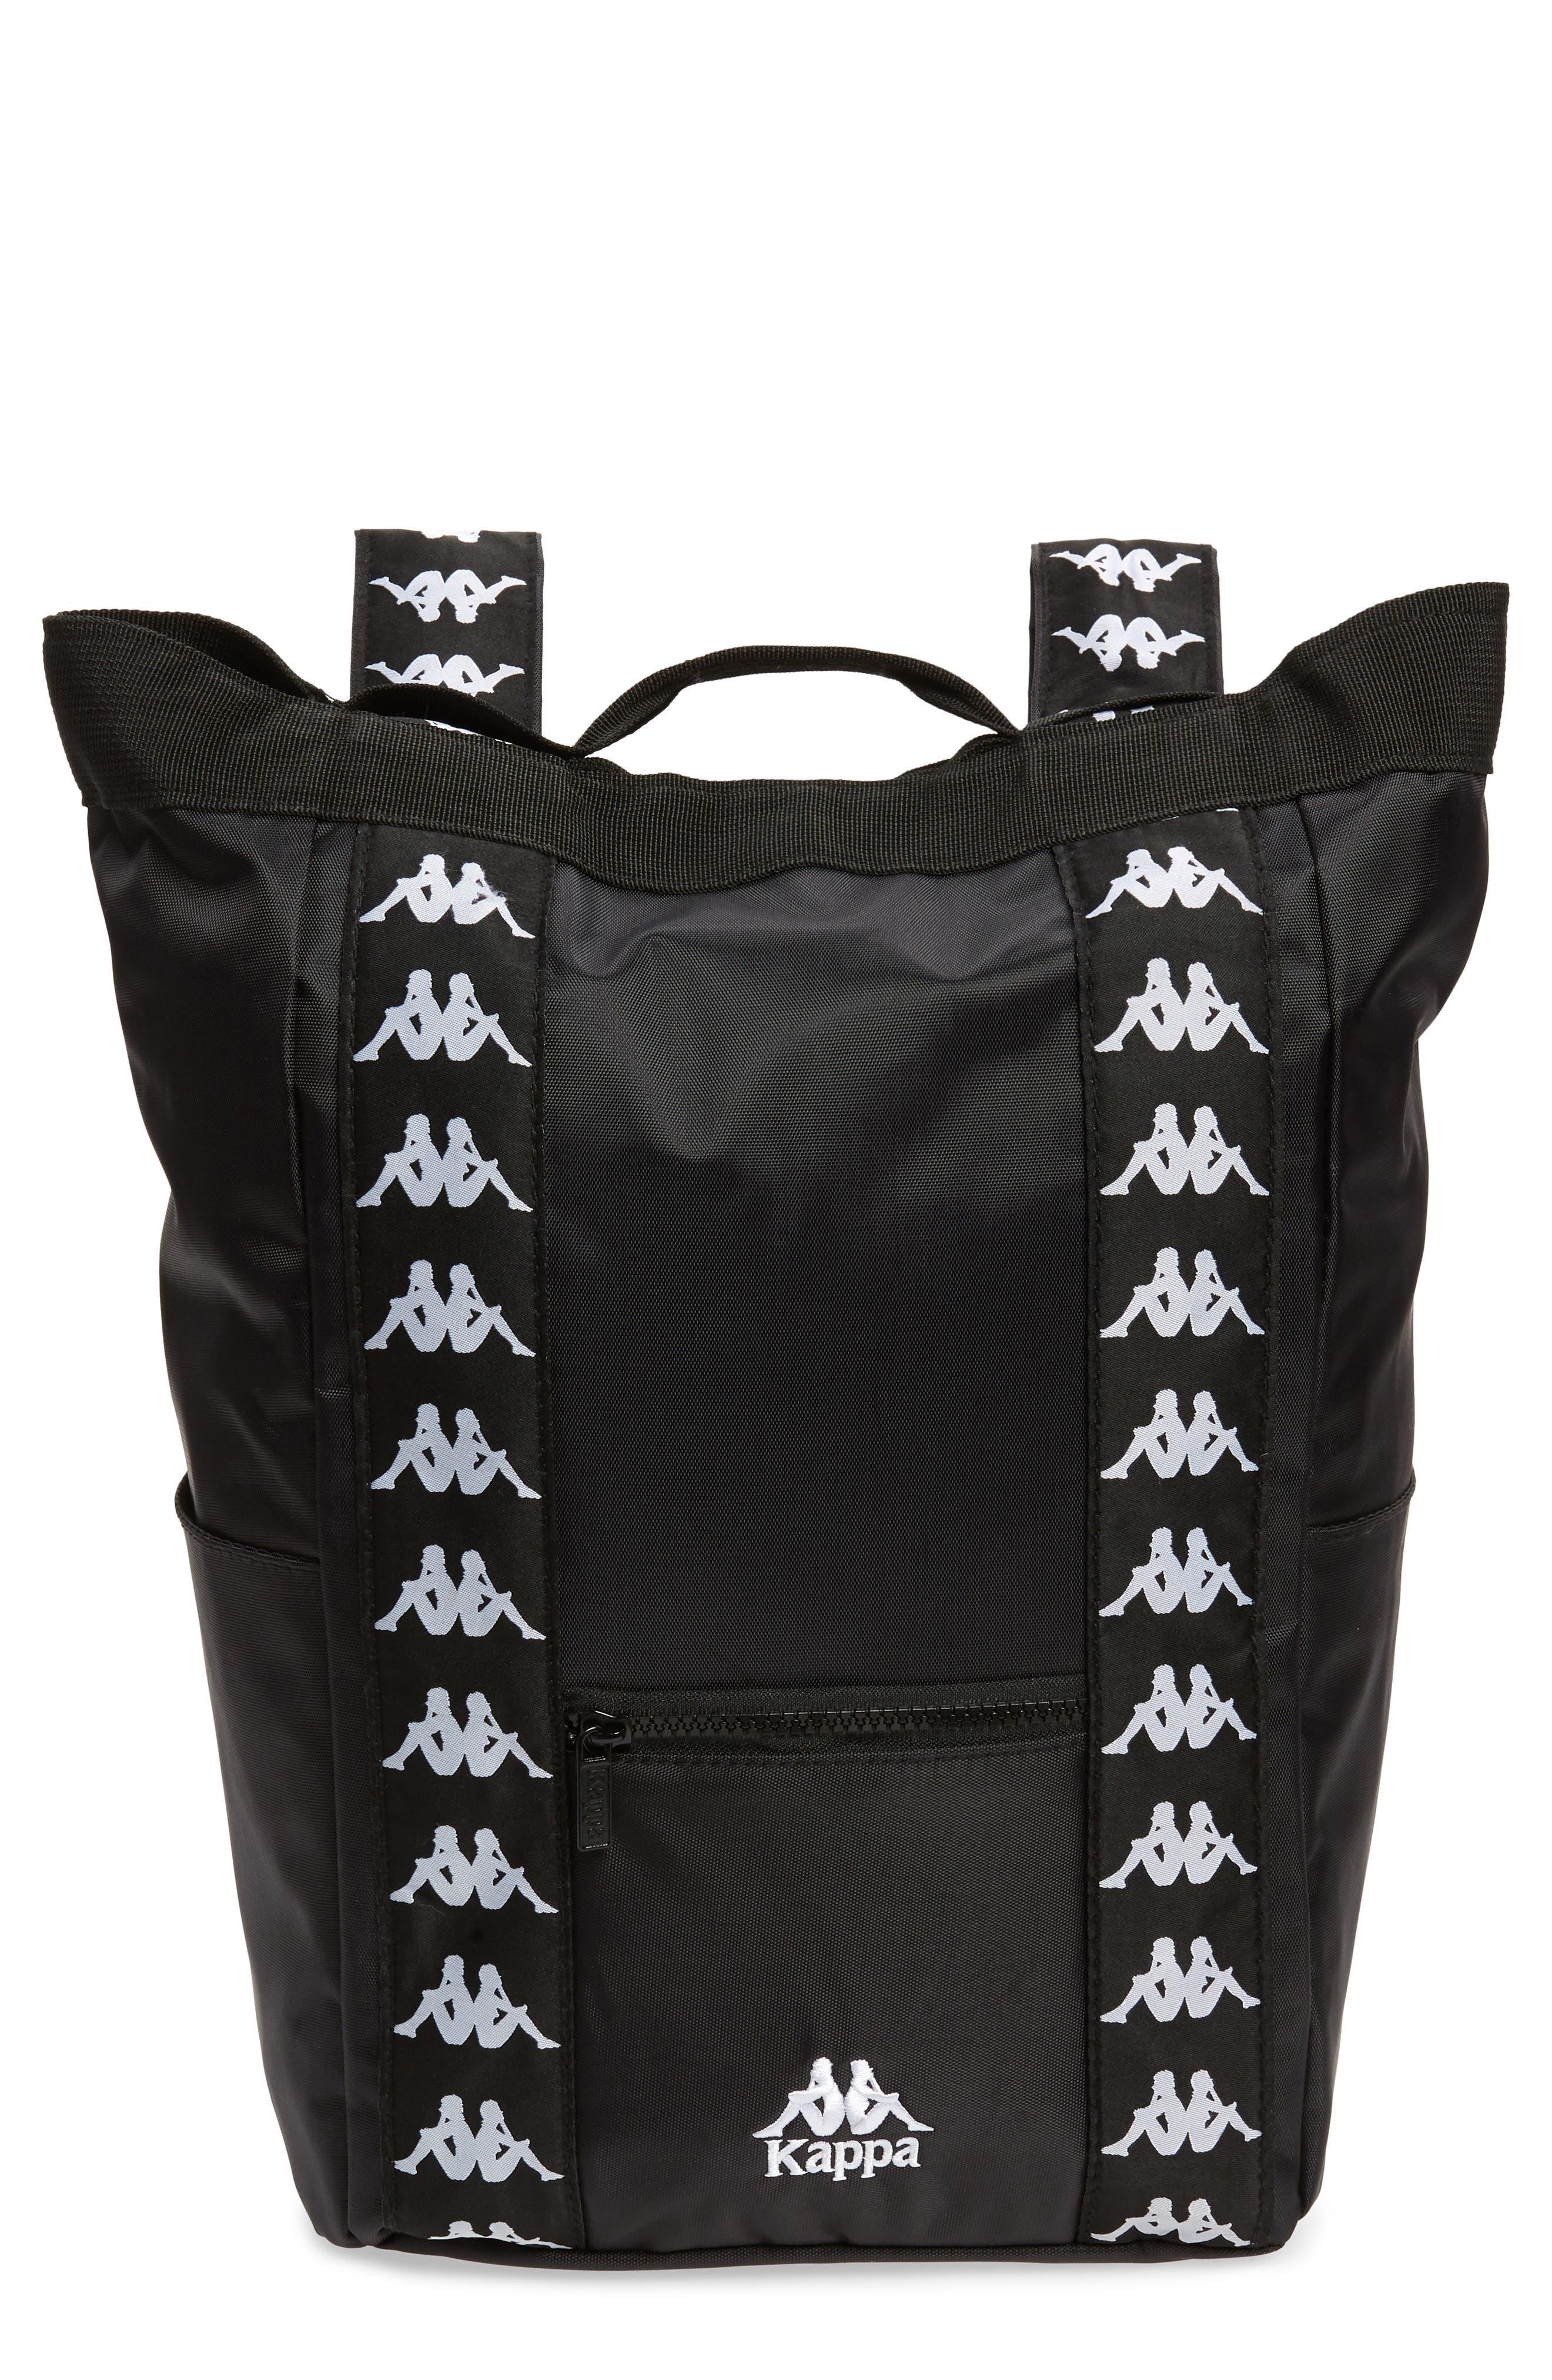 Medium Athletic Backpack,                         Main,                         color, BLACK-WHITE